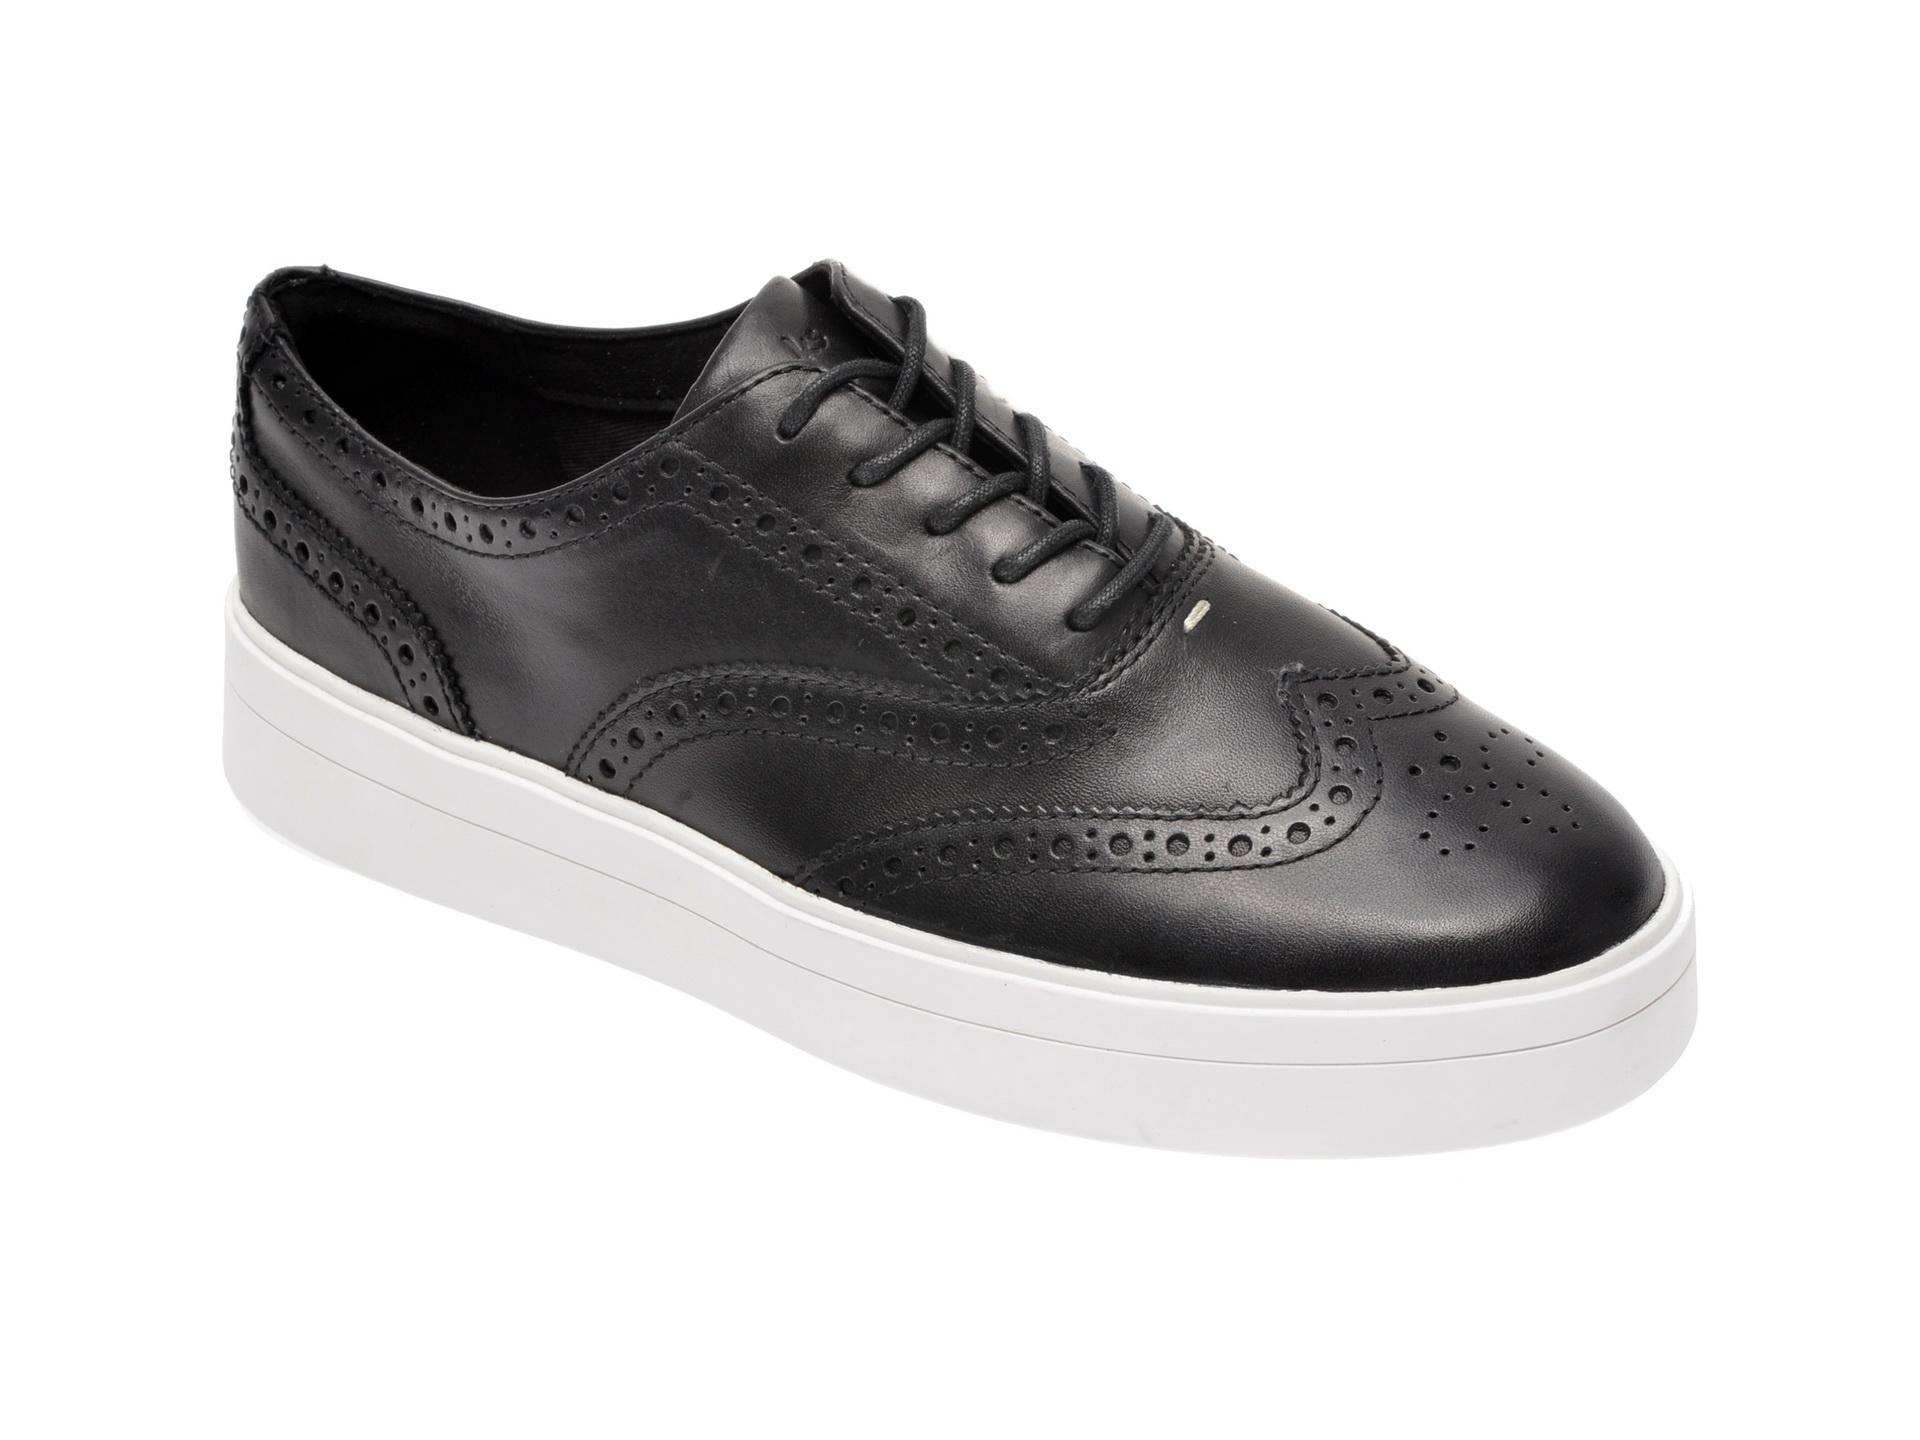 Pantofi CLARKS alb-negru, Hero Brogue., din piele naturala imagine